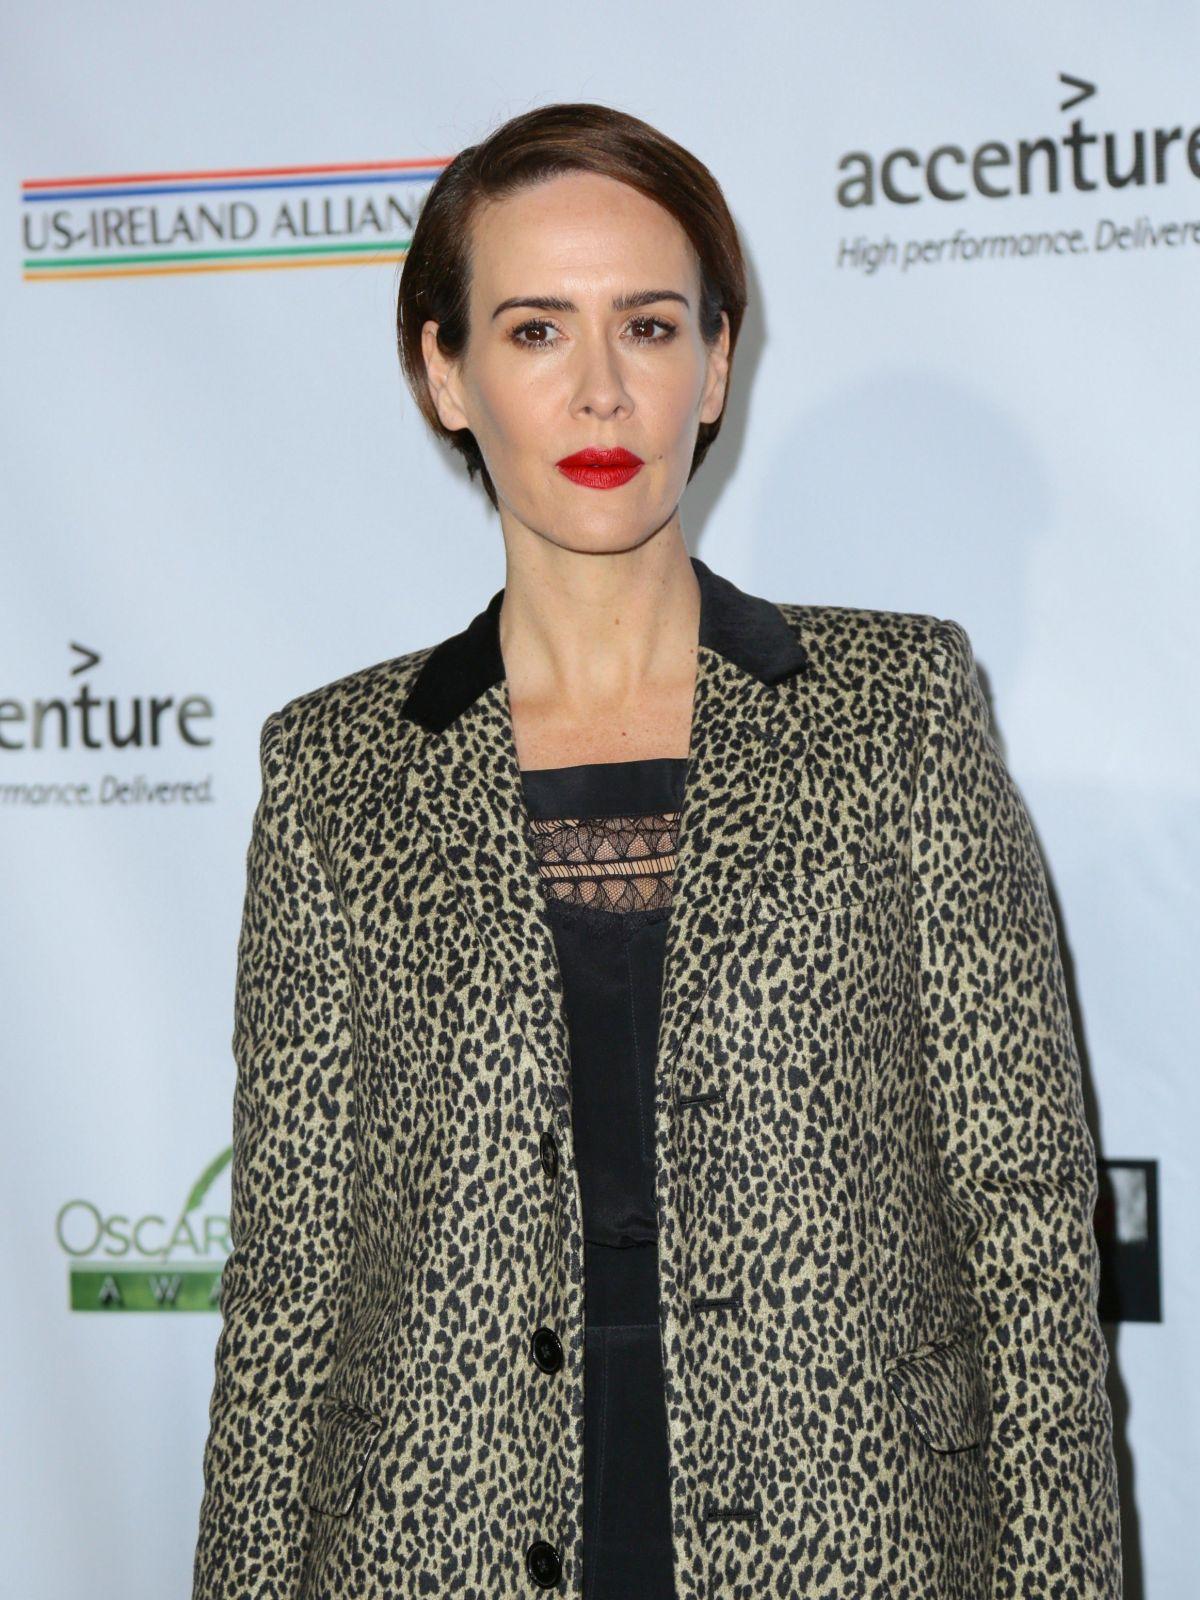 SARAH PAULSON at 12th Annual Oscar Wilde Awards in Santa ...